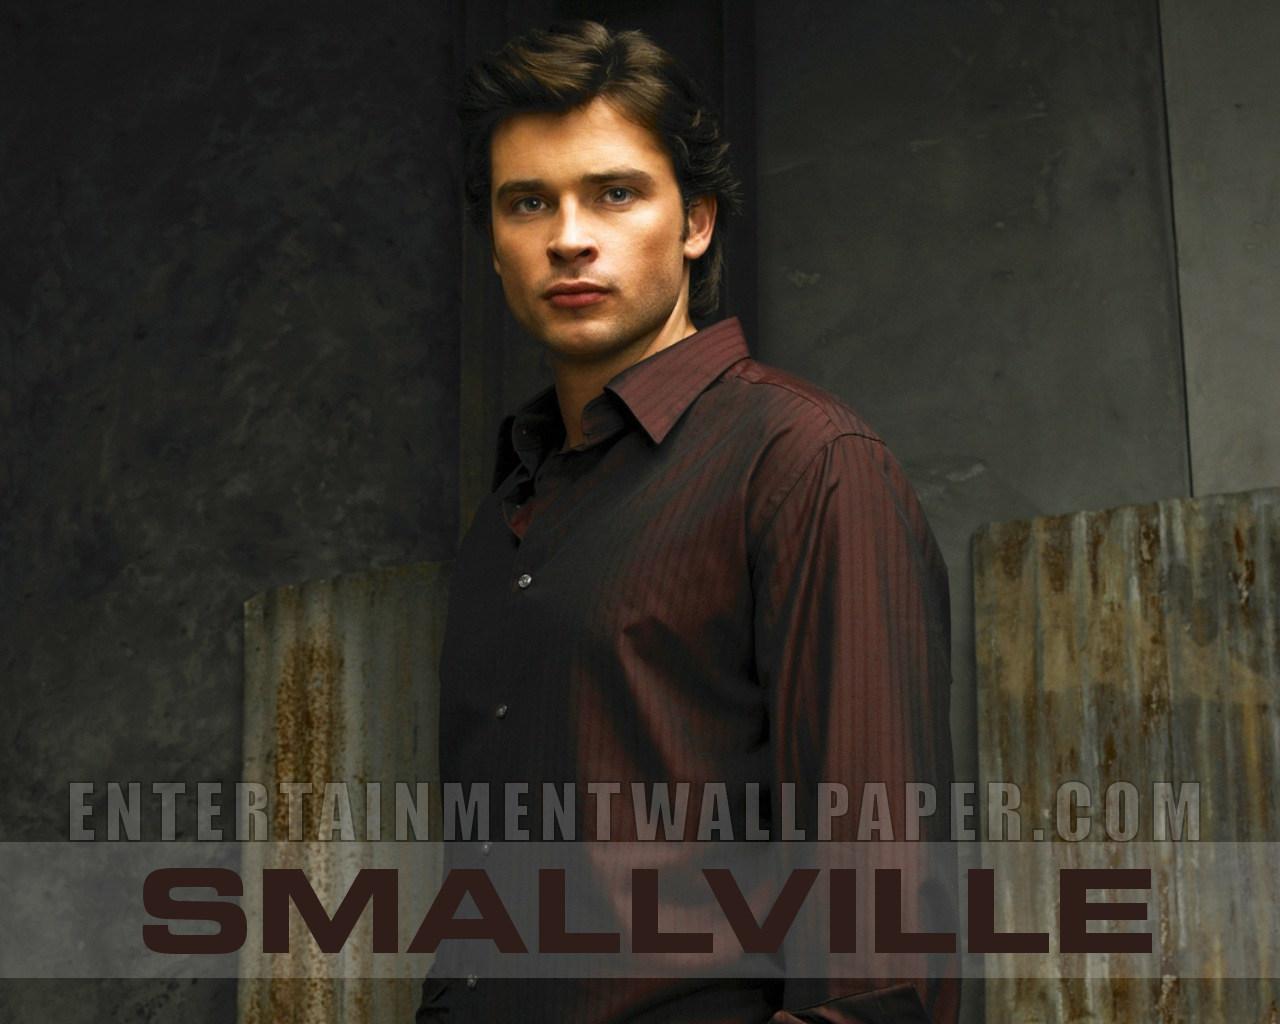 Smallville dublado rmvb 3 temporada - Drop dead diva season 4 torrent ...